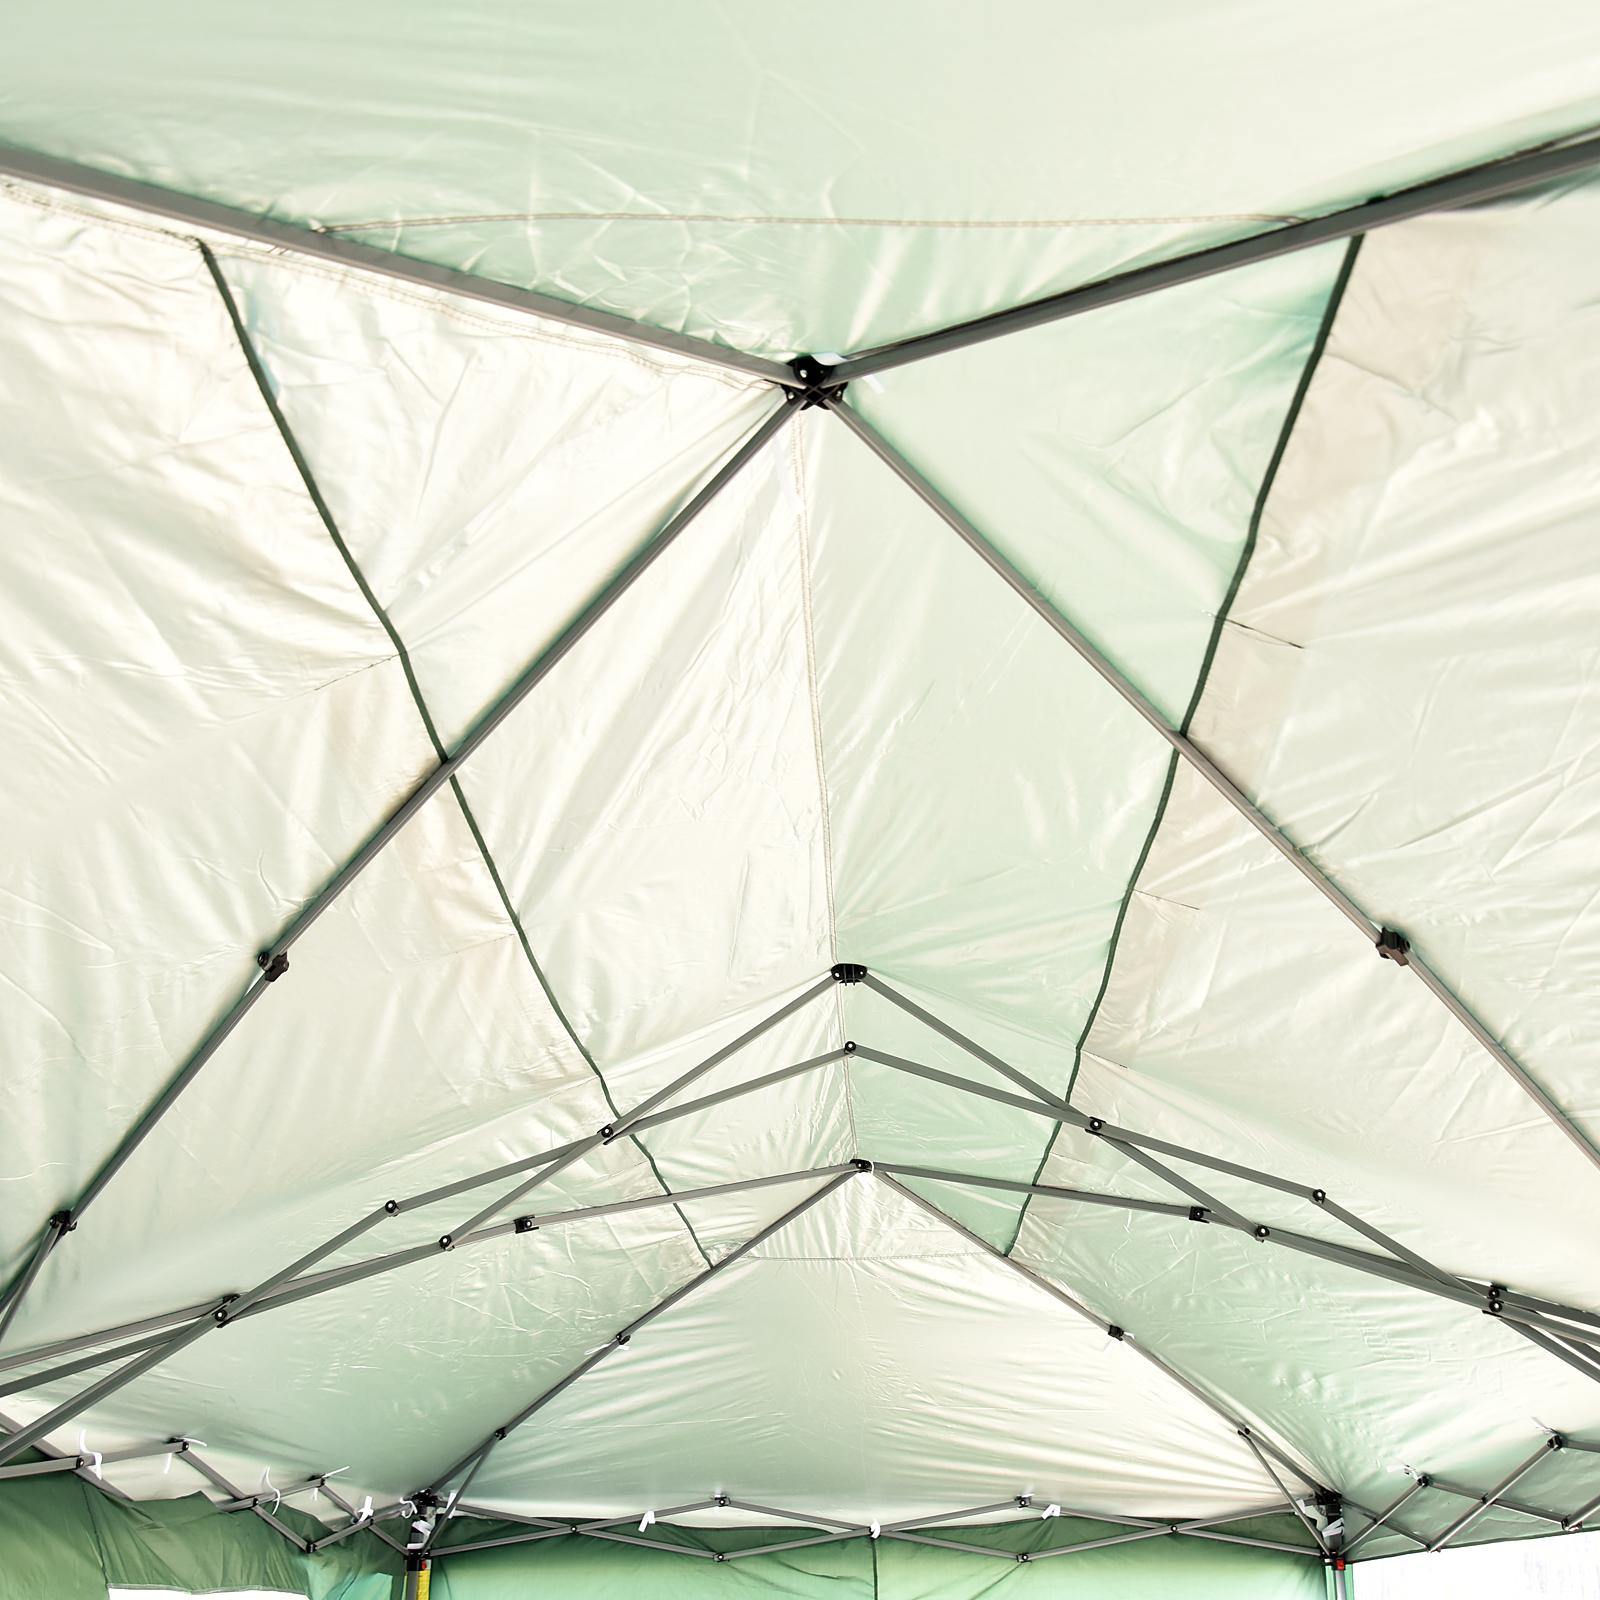 Outdoor-10-039-x20-039-EZ-POP-UP-Gazebo-Wedding-Party-Tent-Canopy-Folding-w-Carry-Bag thumbnail 29